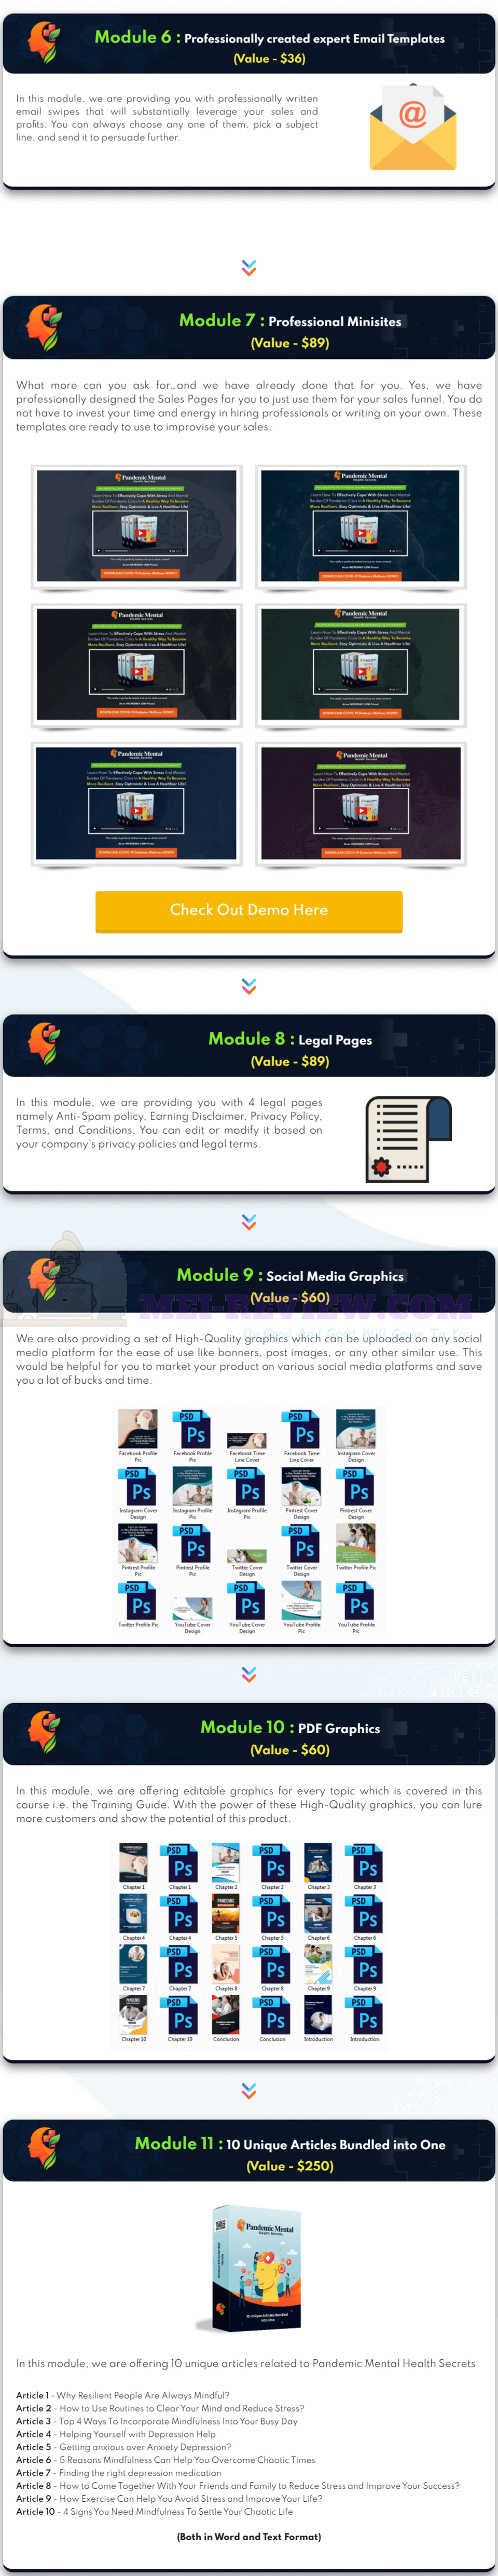 Pandemic-Mental-Health-Secrets-PLR-modules